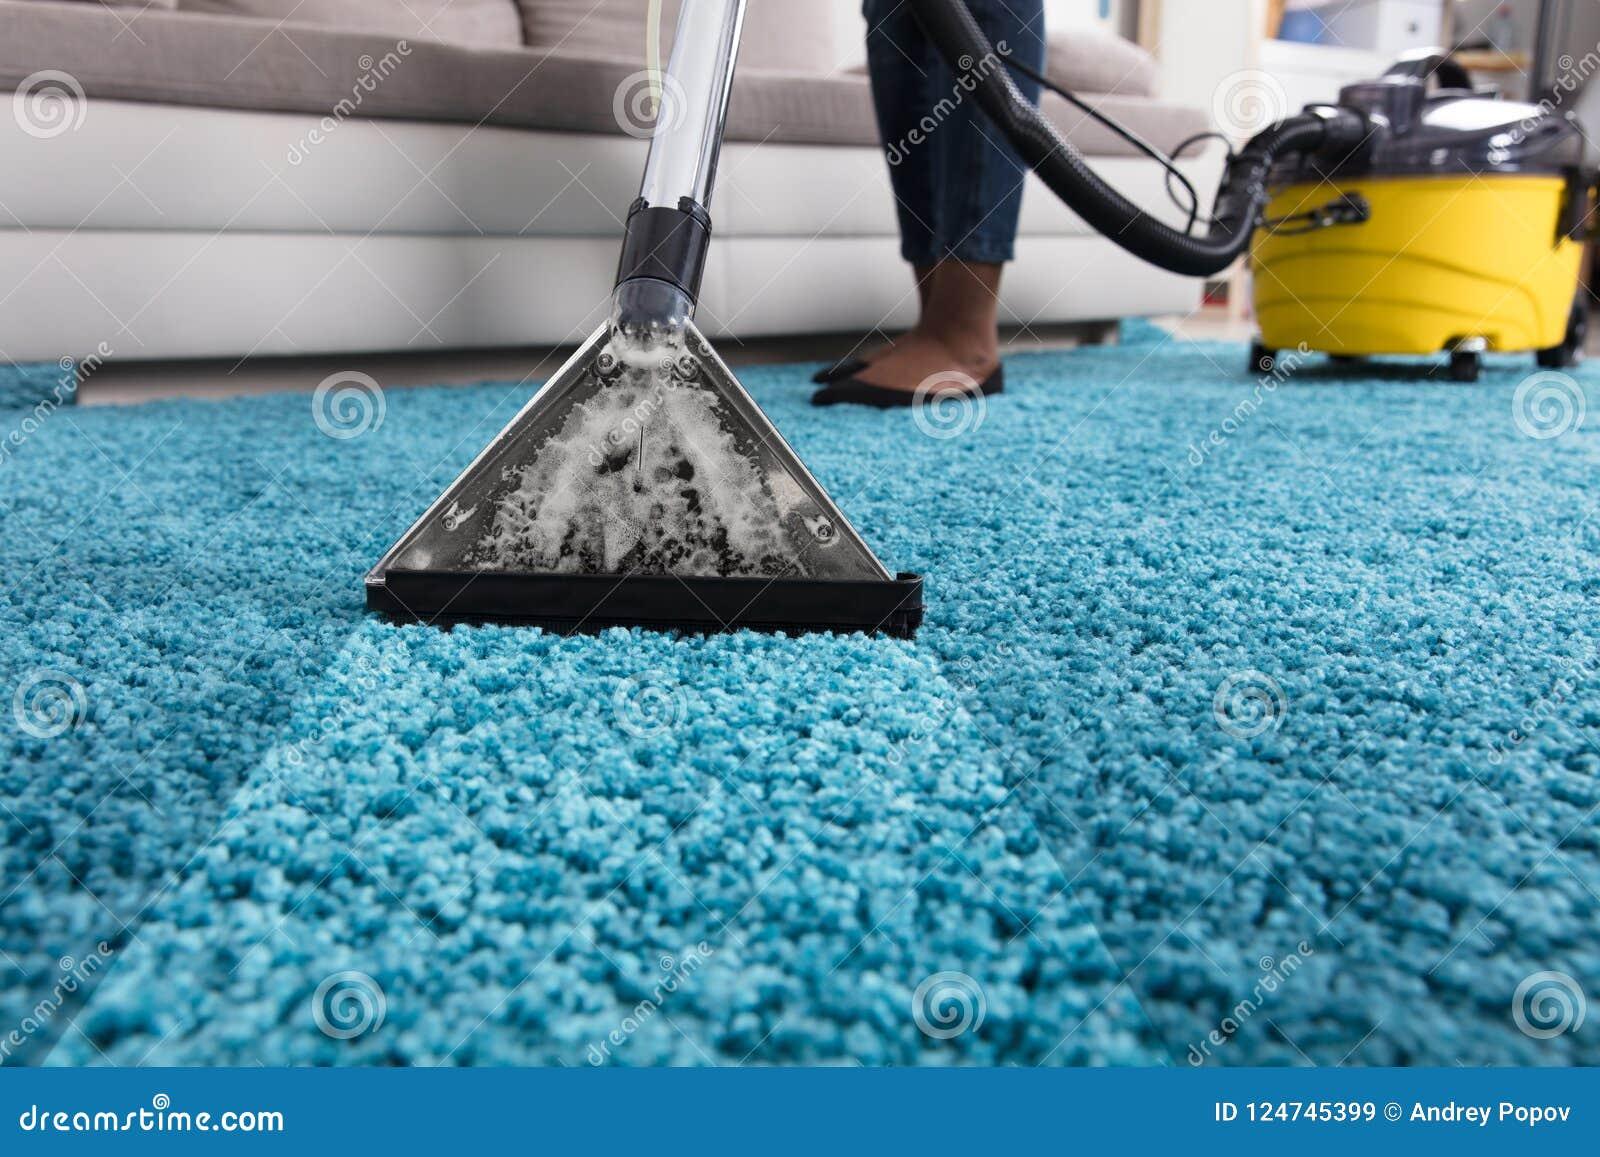 Alfombra de la limpieza de Person Using Vacuum Cleaner For